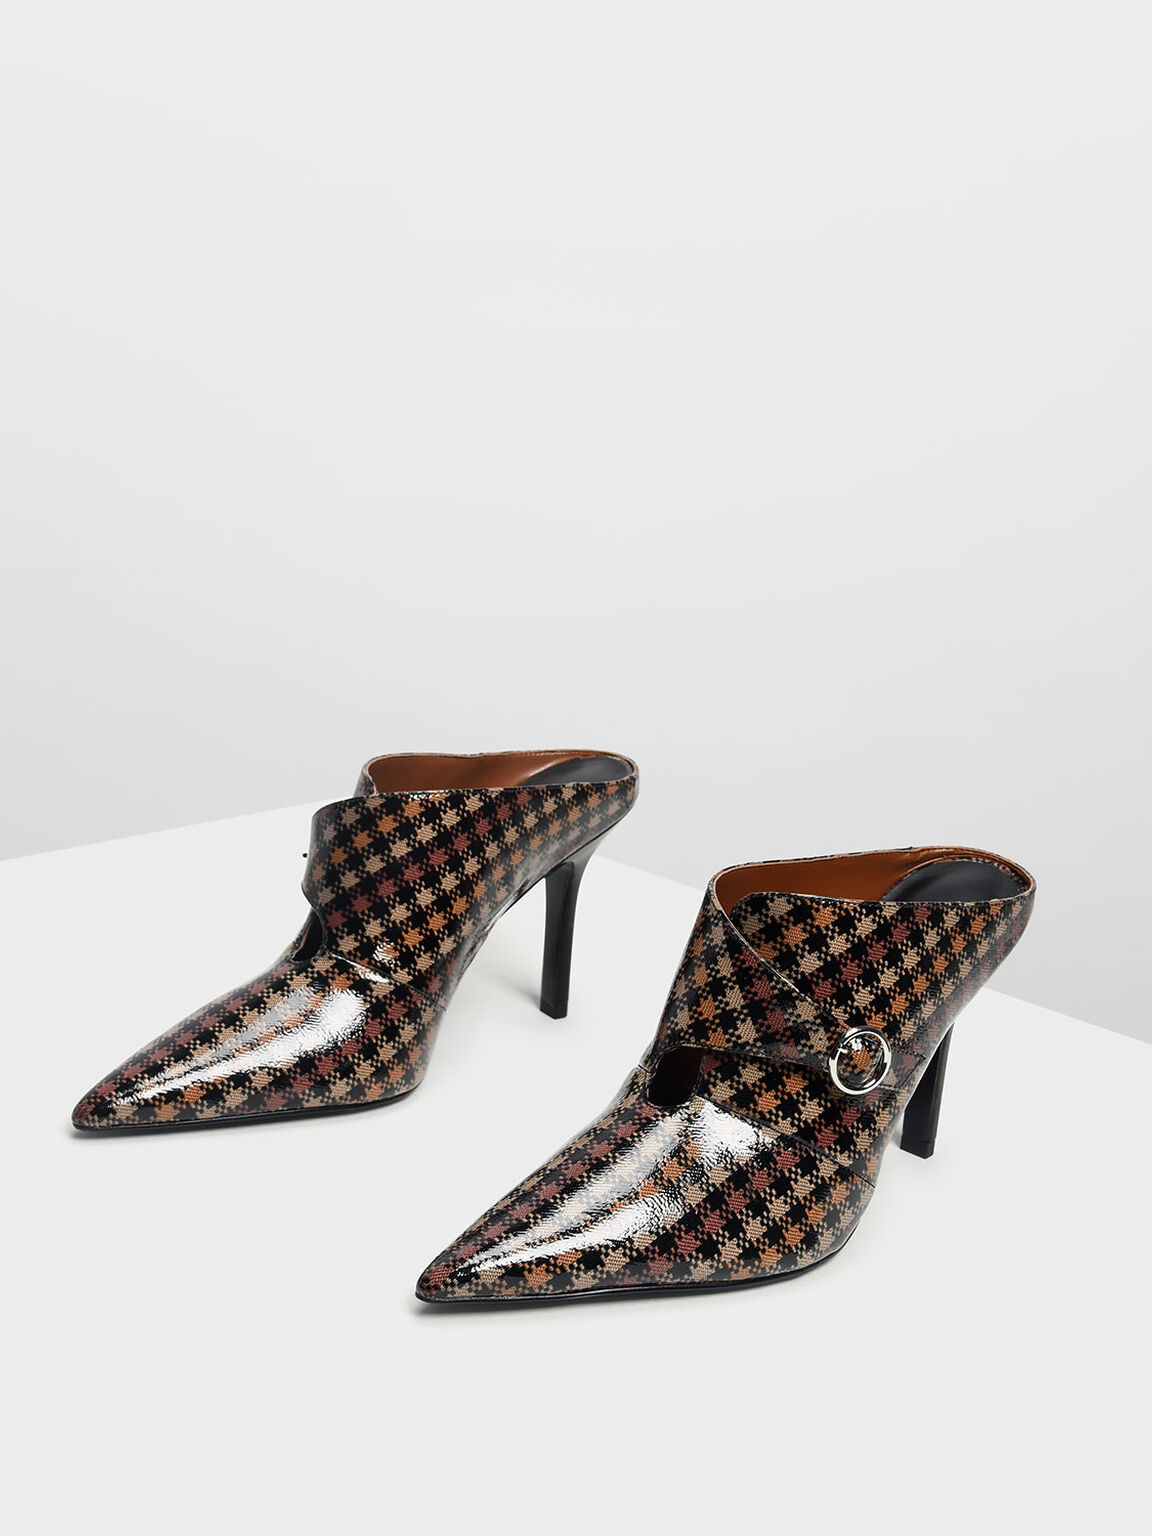 Houndstooth Print Stiletto Heel Mules, Brown, hi-res